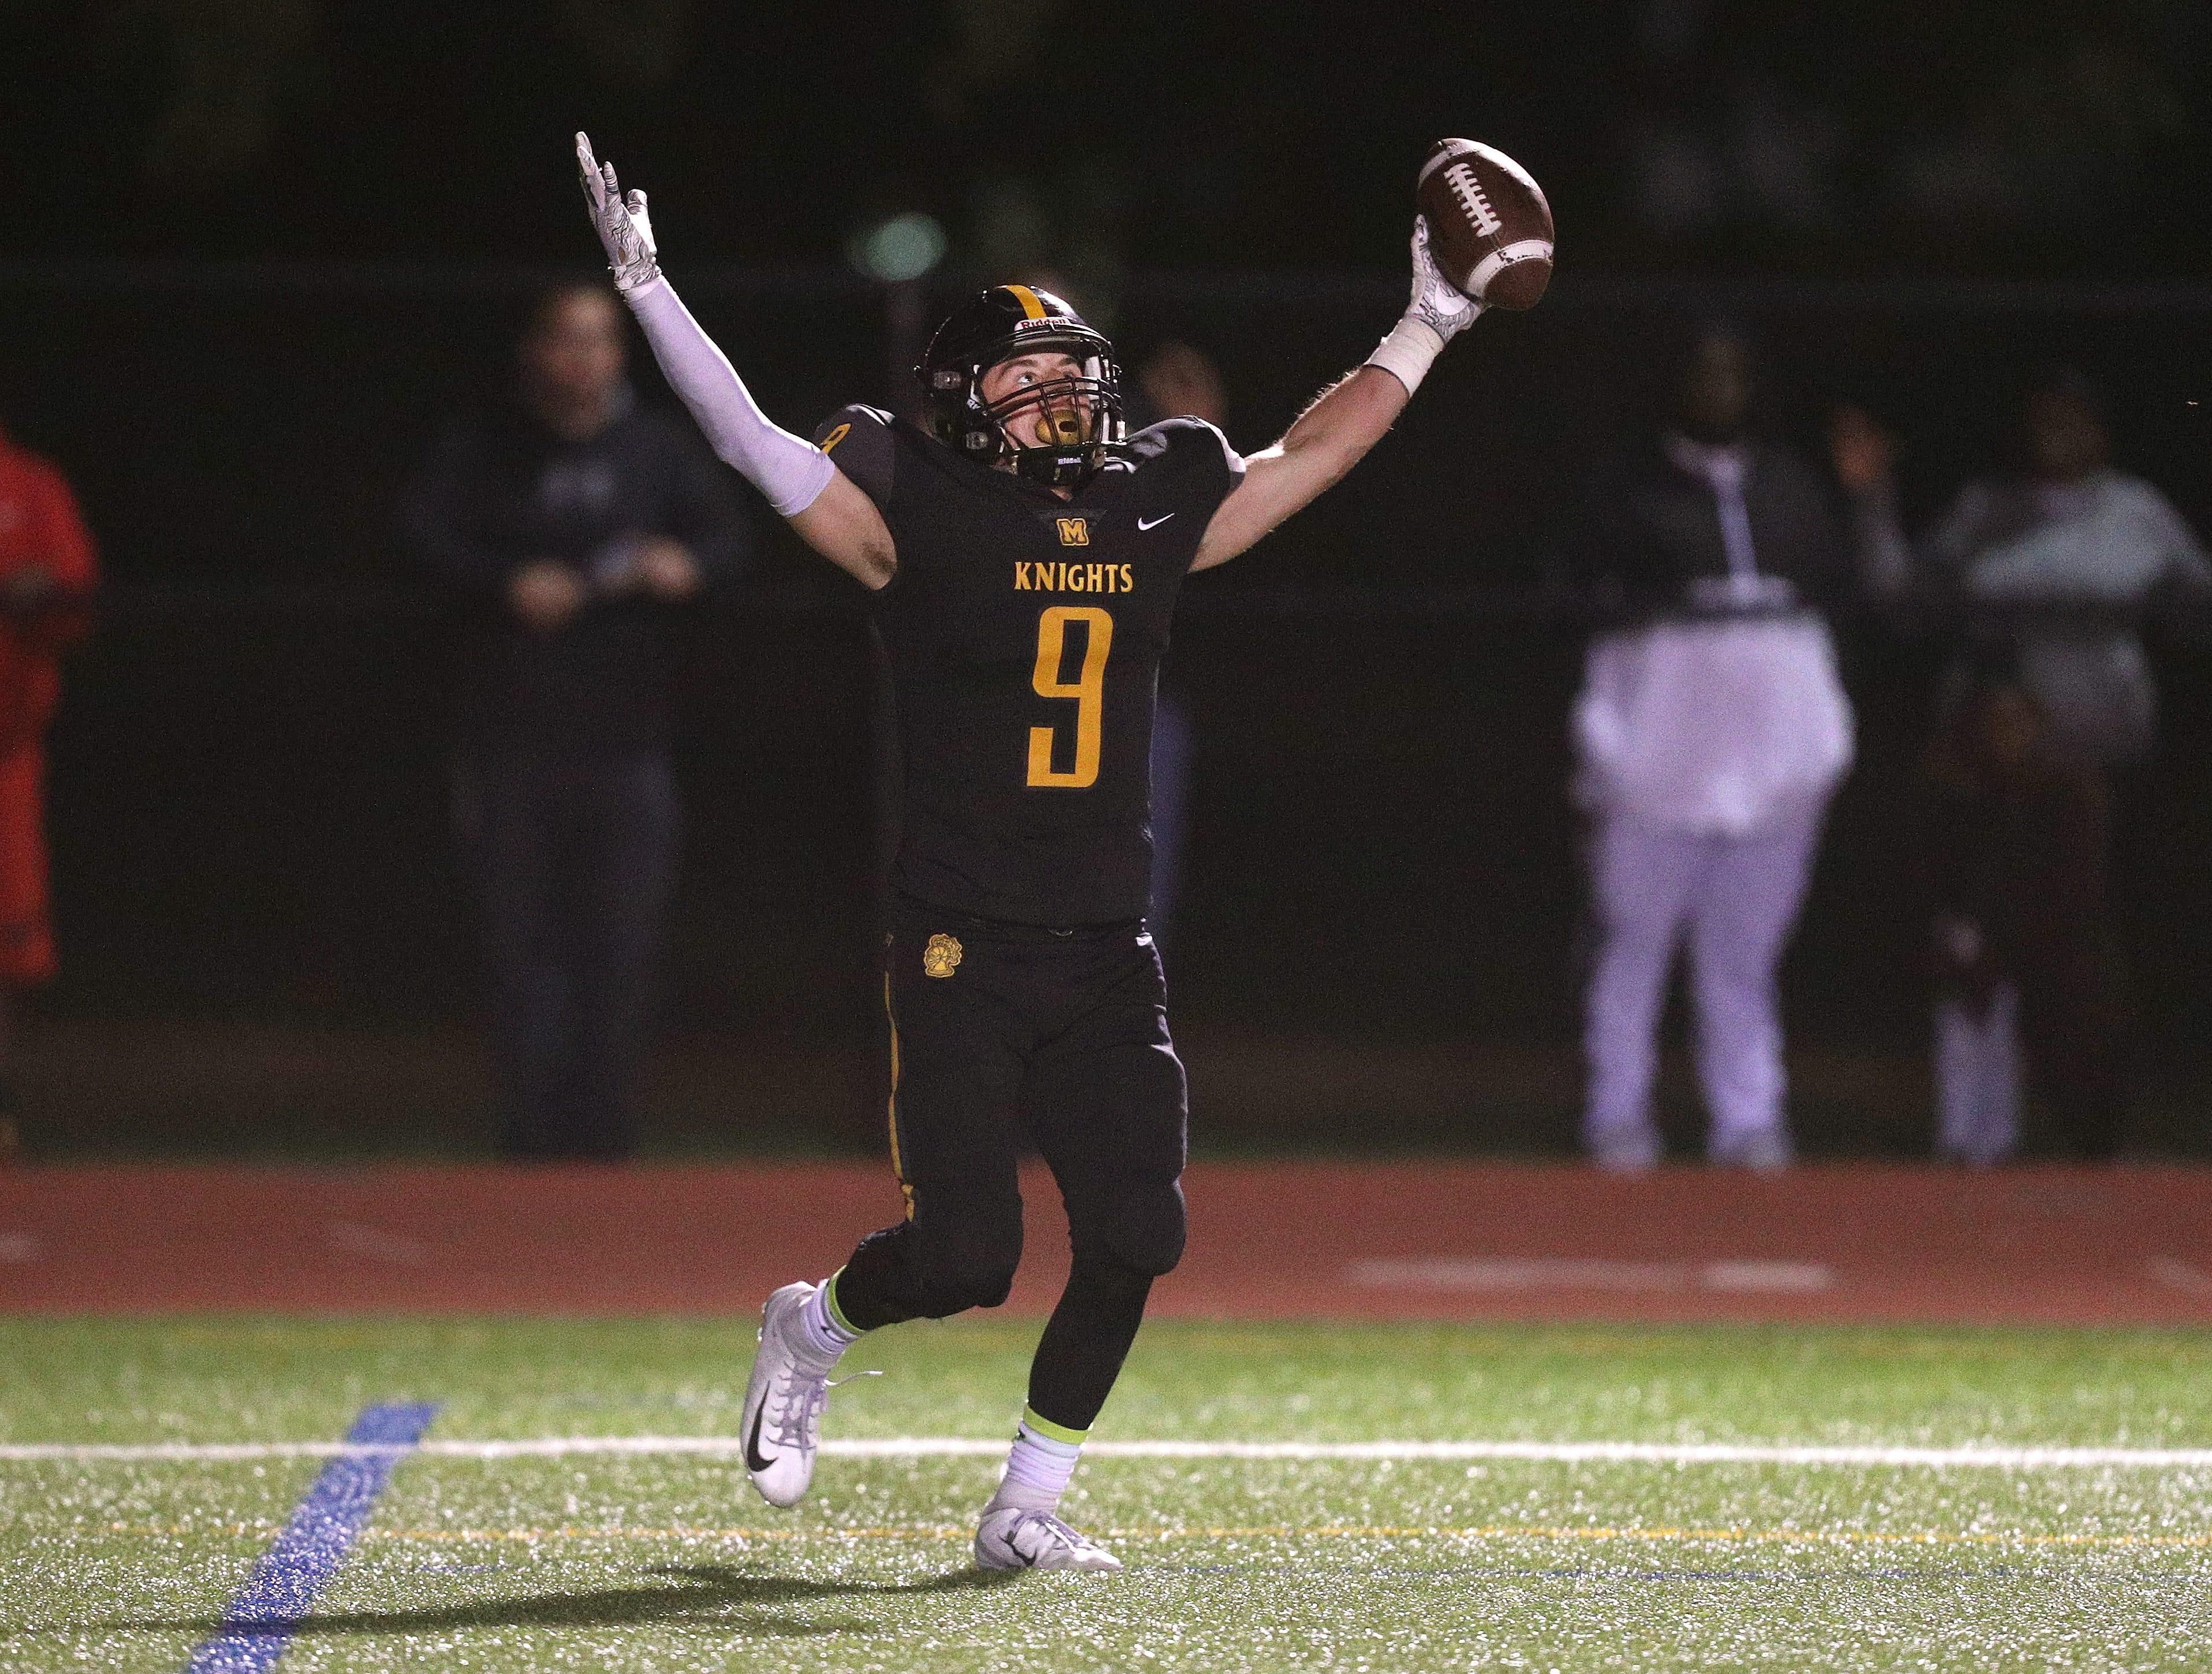 McQuaid's Ben Beauchamp celebrates a touchdown catch in a 38-34 win over Wilson.